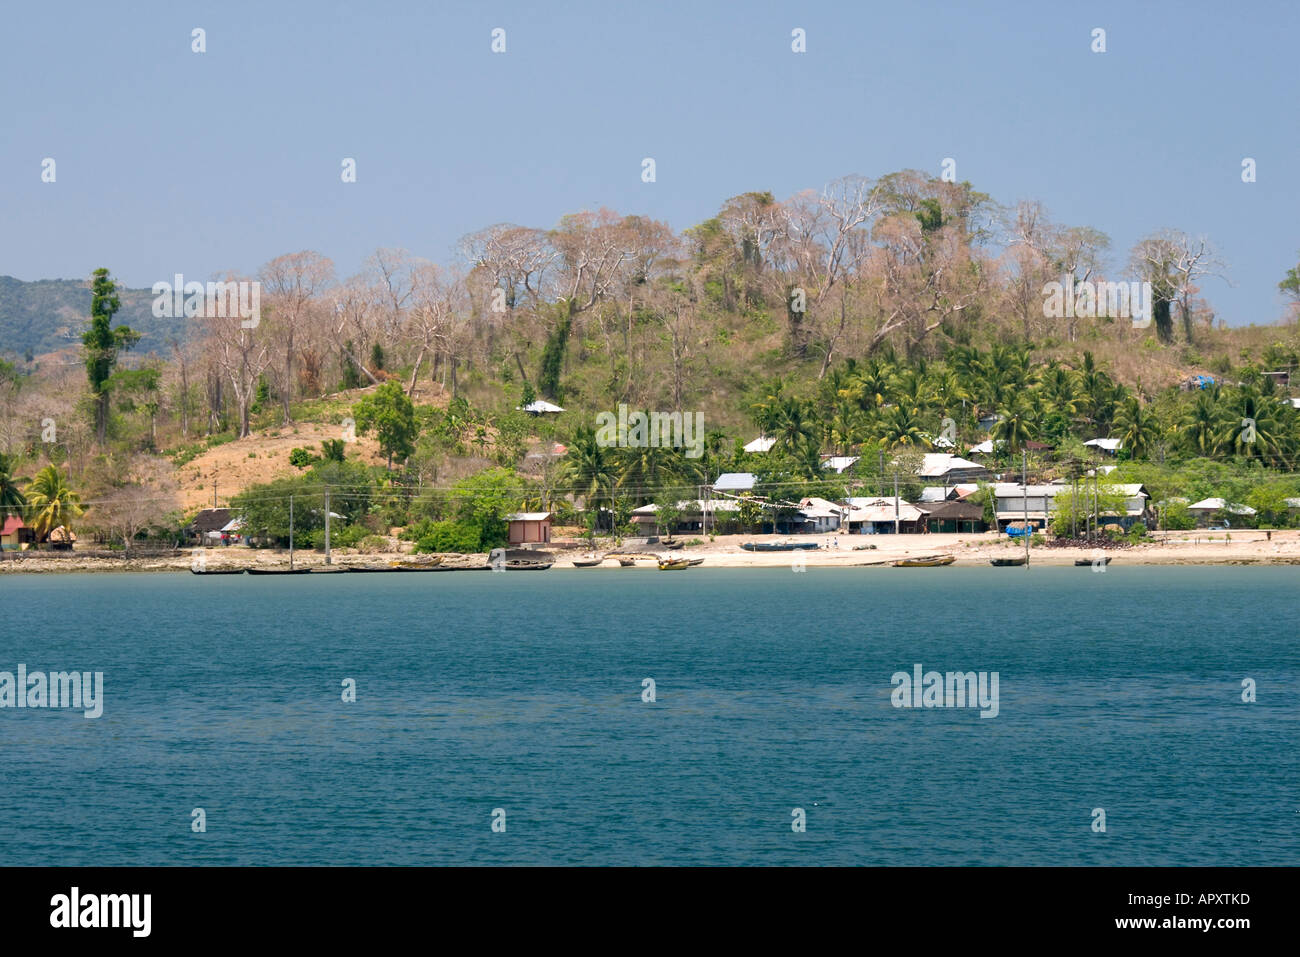 Long island, Andaman Islands, India, Long Island, Andamanen, Indien Long island - Stock Image